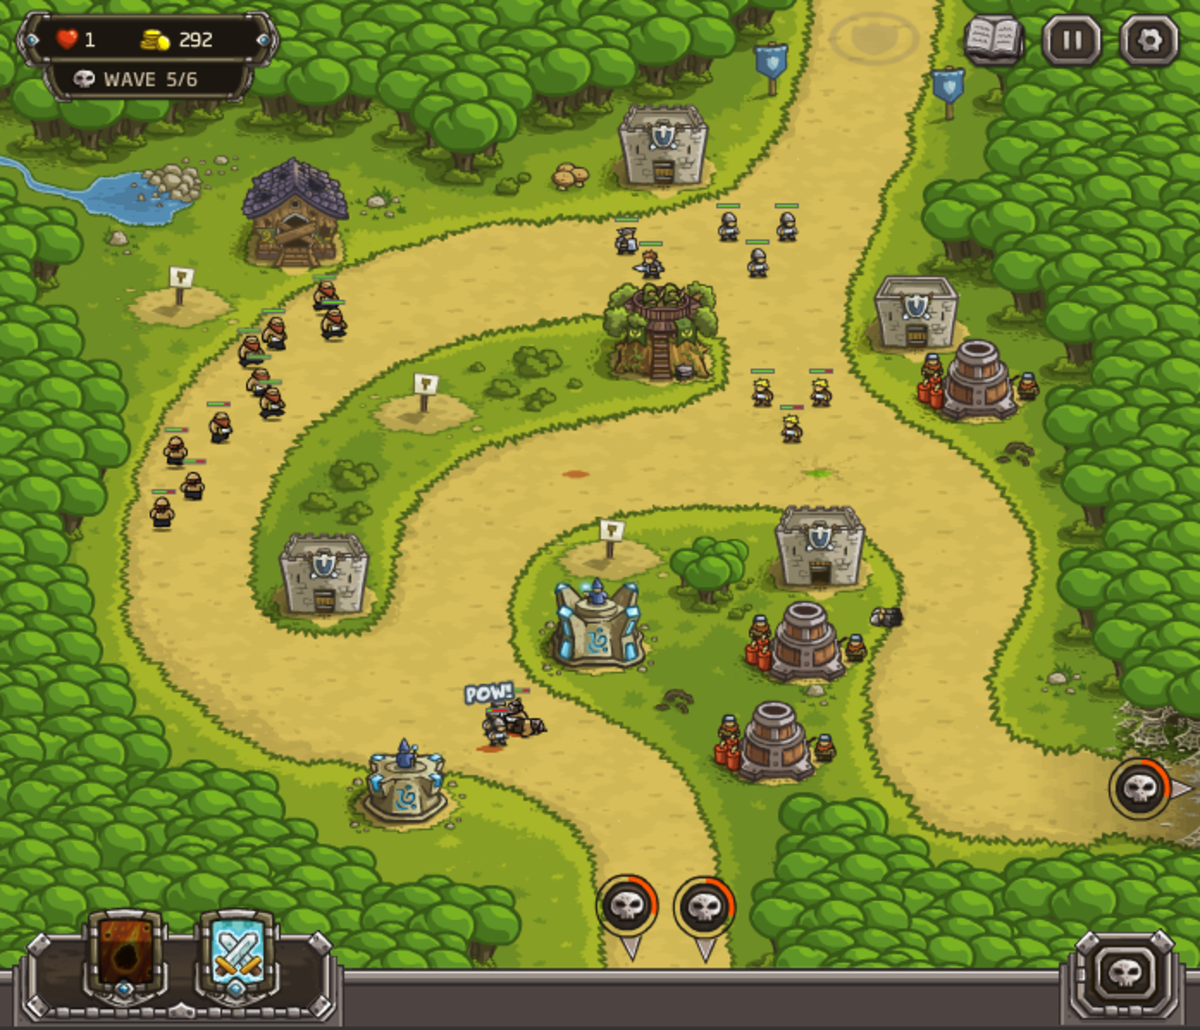 Kingdom Rush Walkthrough: Level 5 - Silveroak Outpost